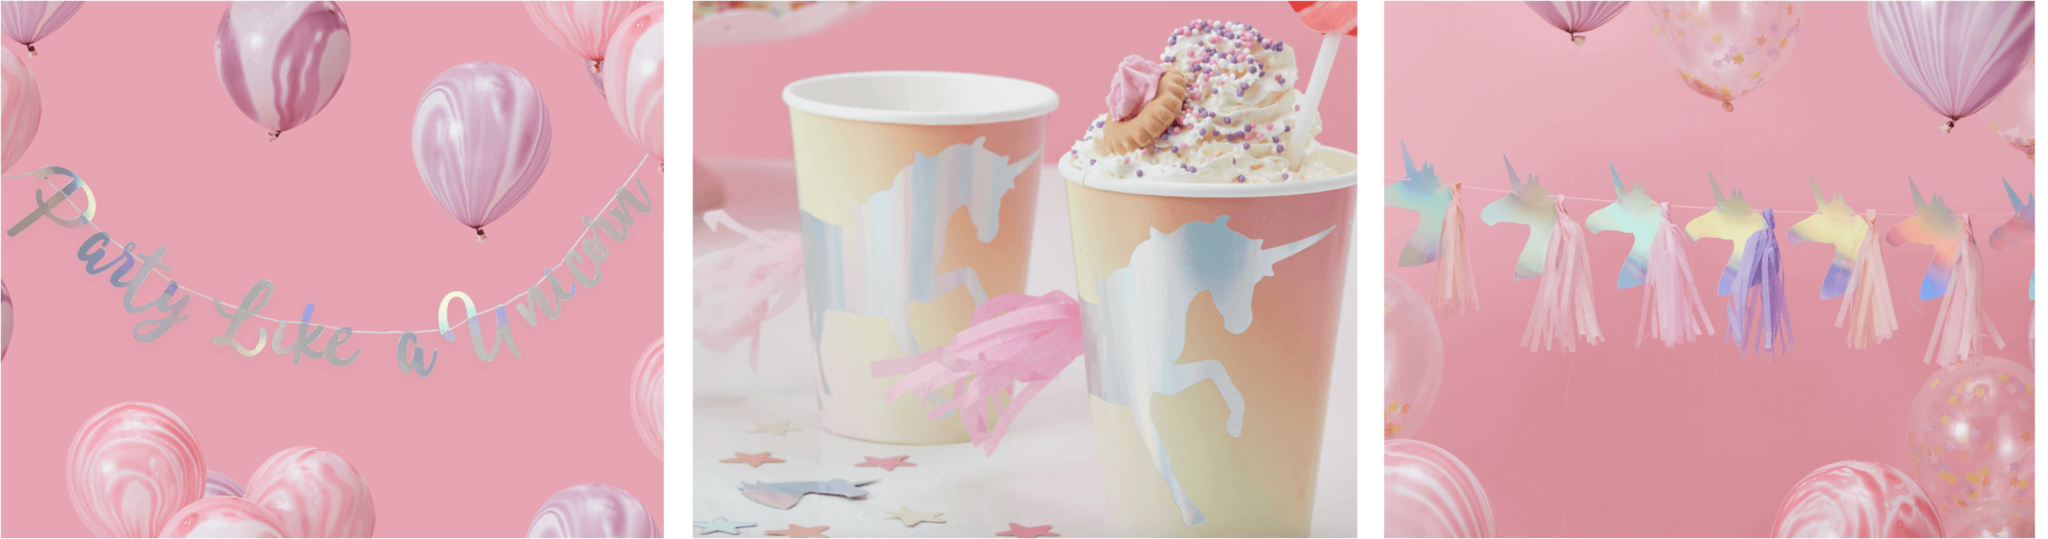 Kinderfeestje versiering thema unicorn